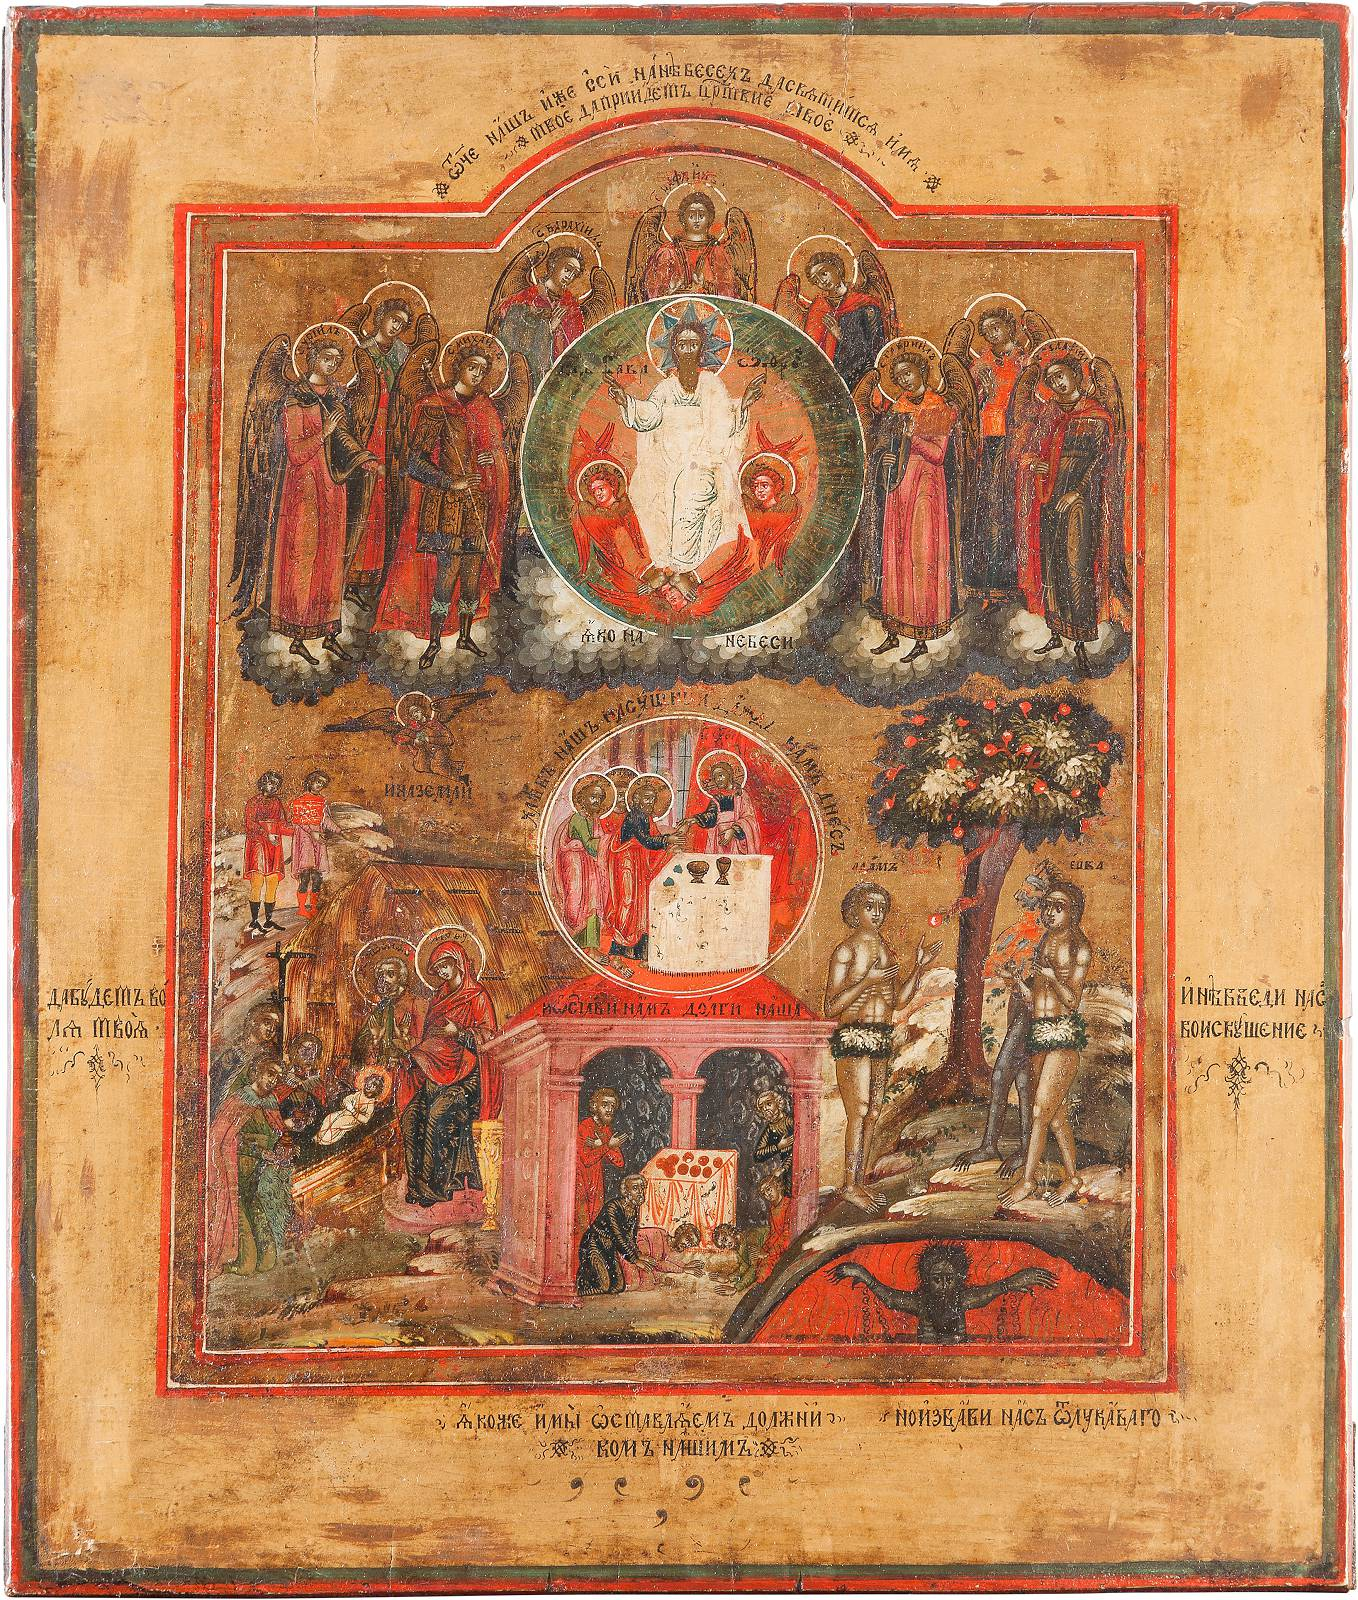 A VERY RARE ICON: A VISUAL REPRESENTATION OF THE LORD'S PRAYER 'OUR FATHER'Russian, circa 1800